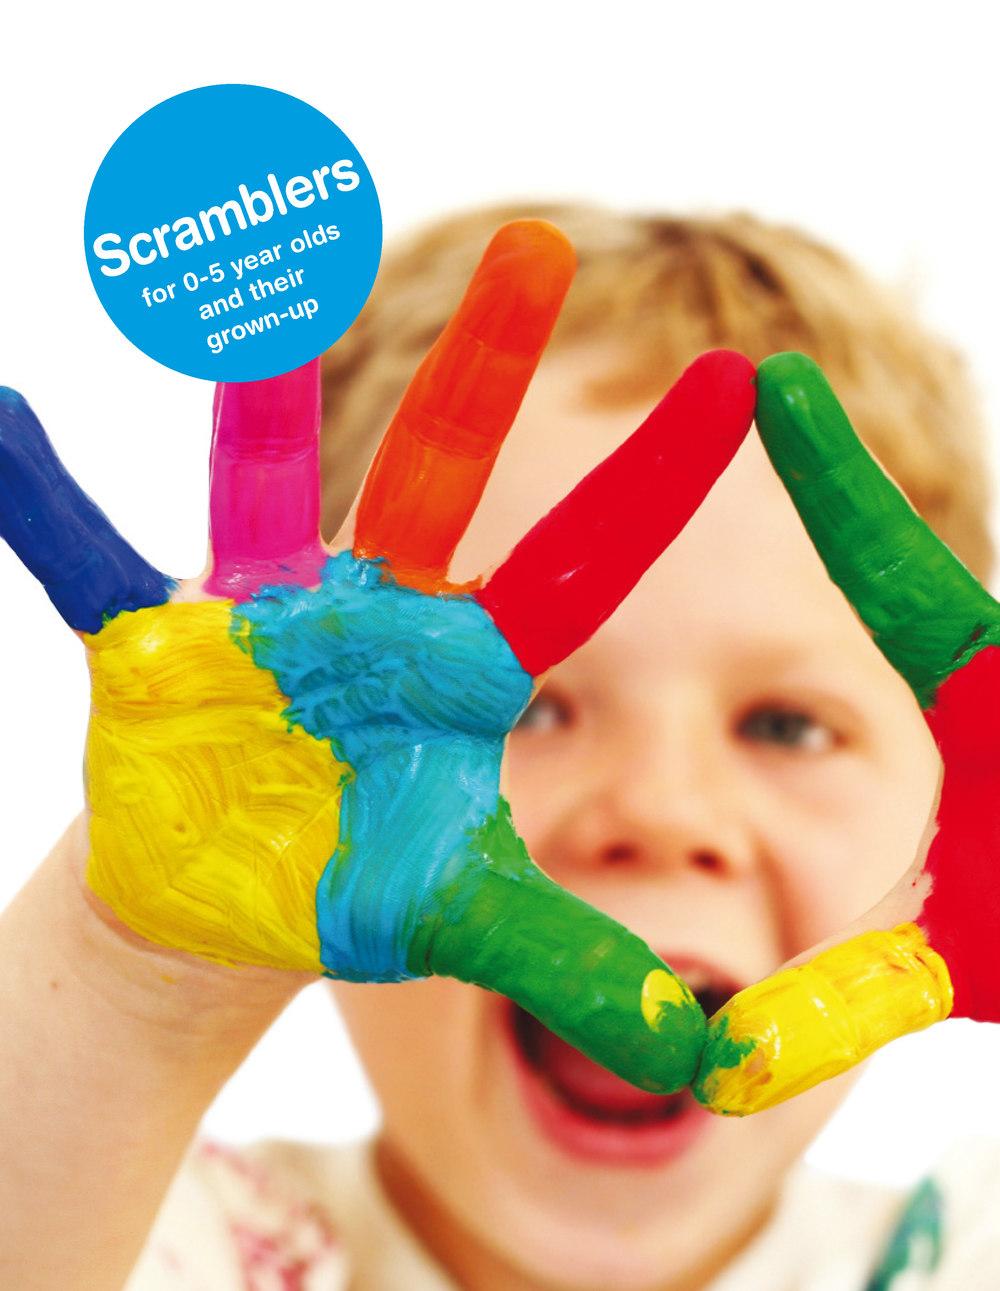 Scramblers_107x139 Postcard_Page_1.jpg